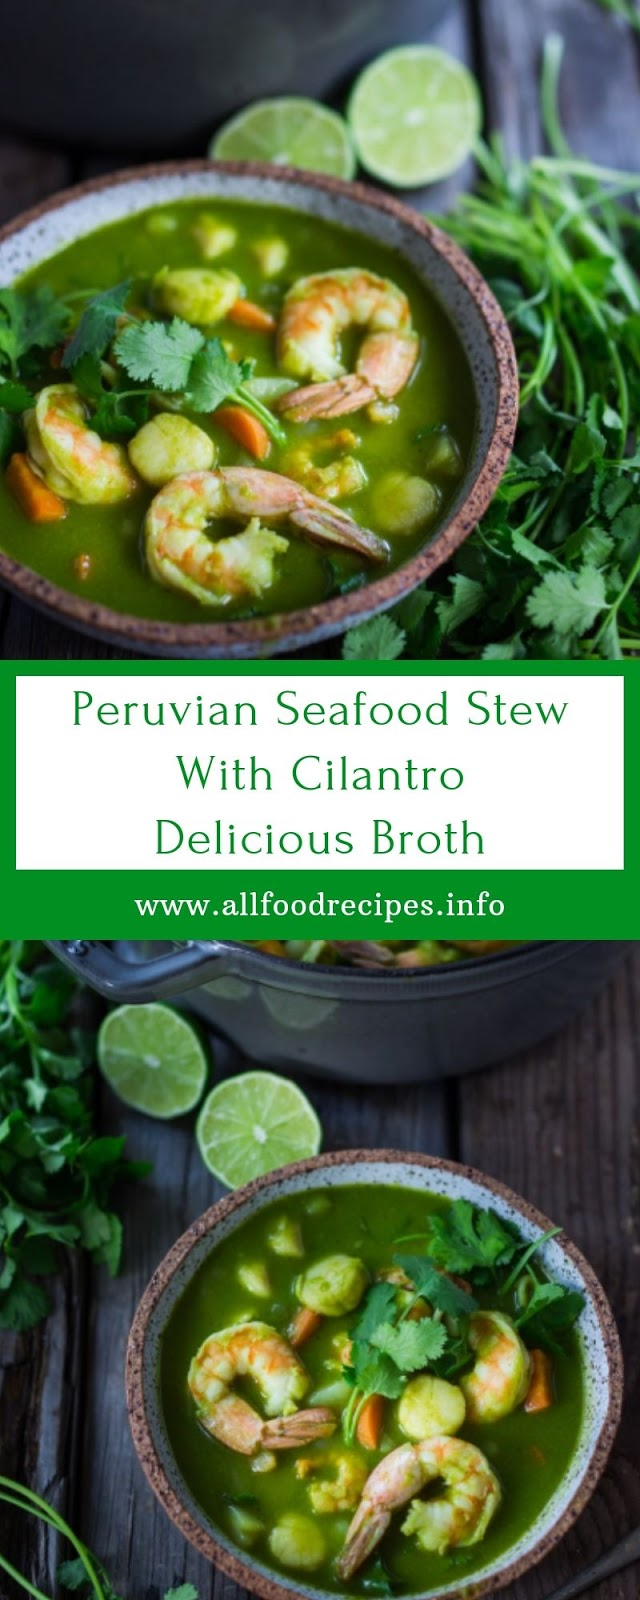 Peruvian Seafood Stew With Cilantro Delicious Broth